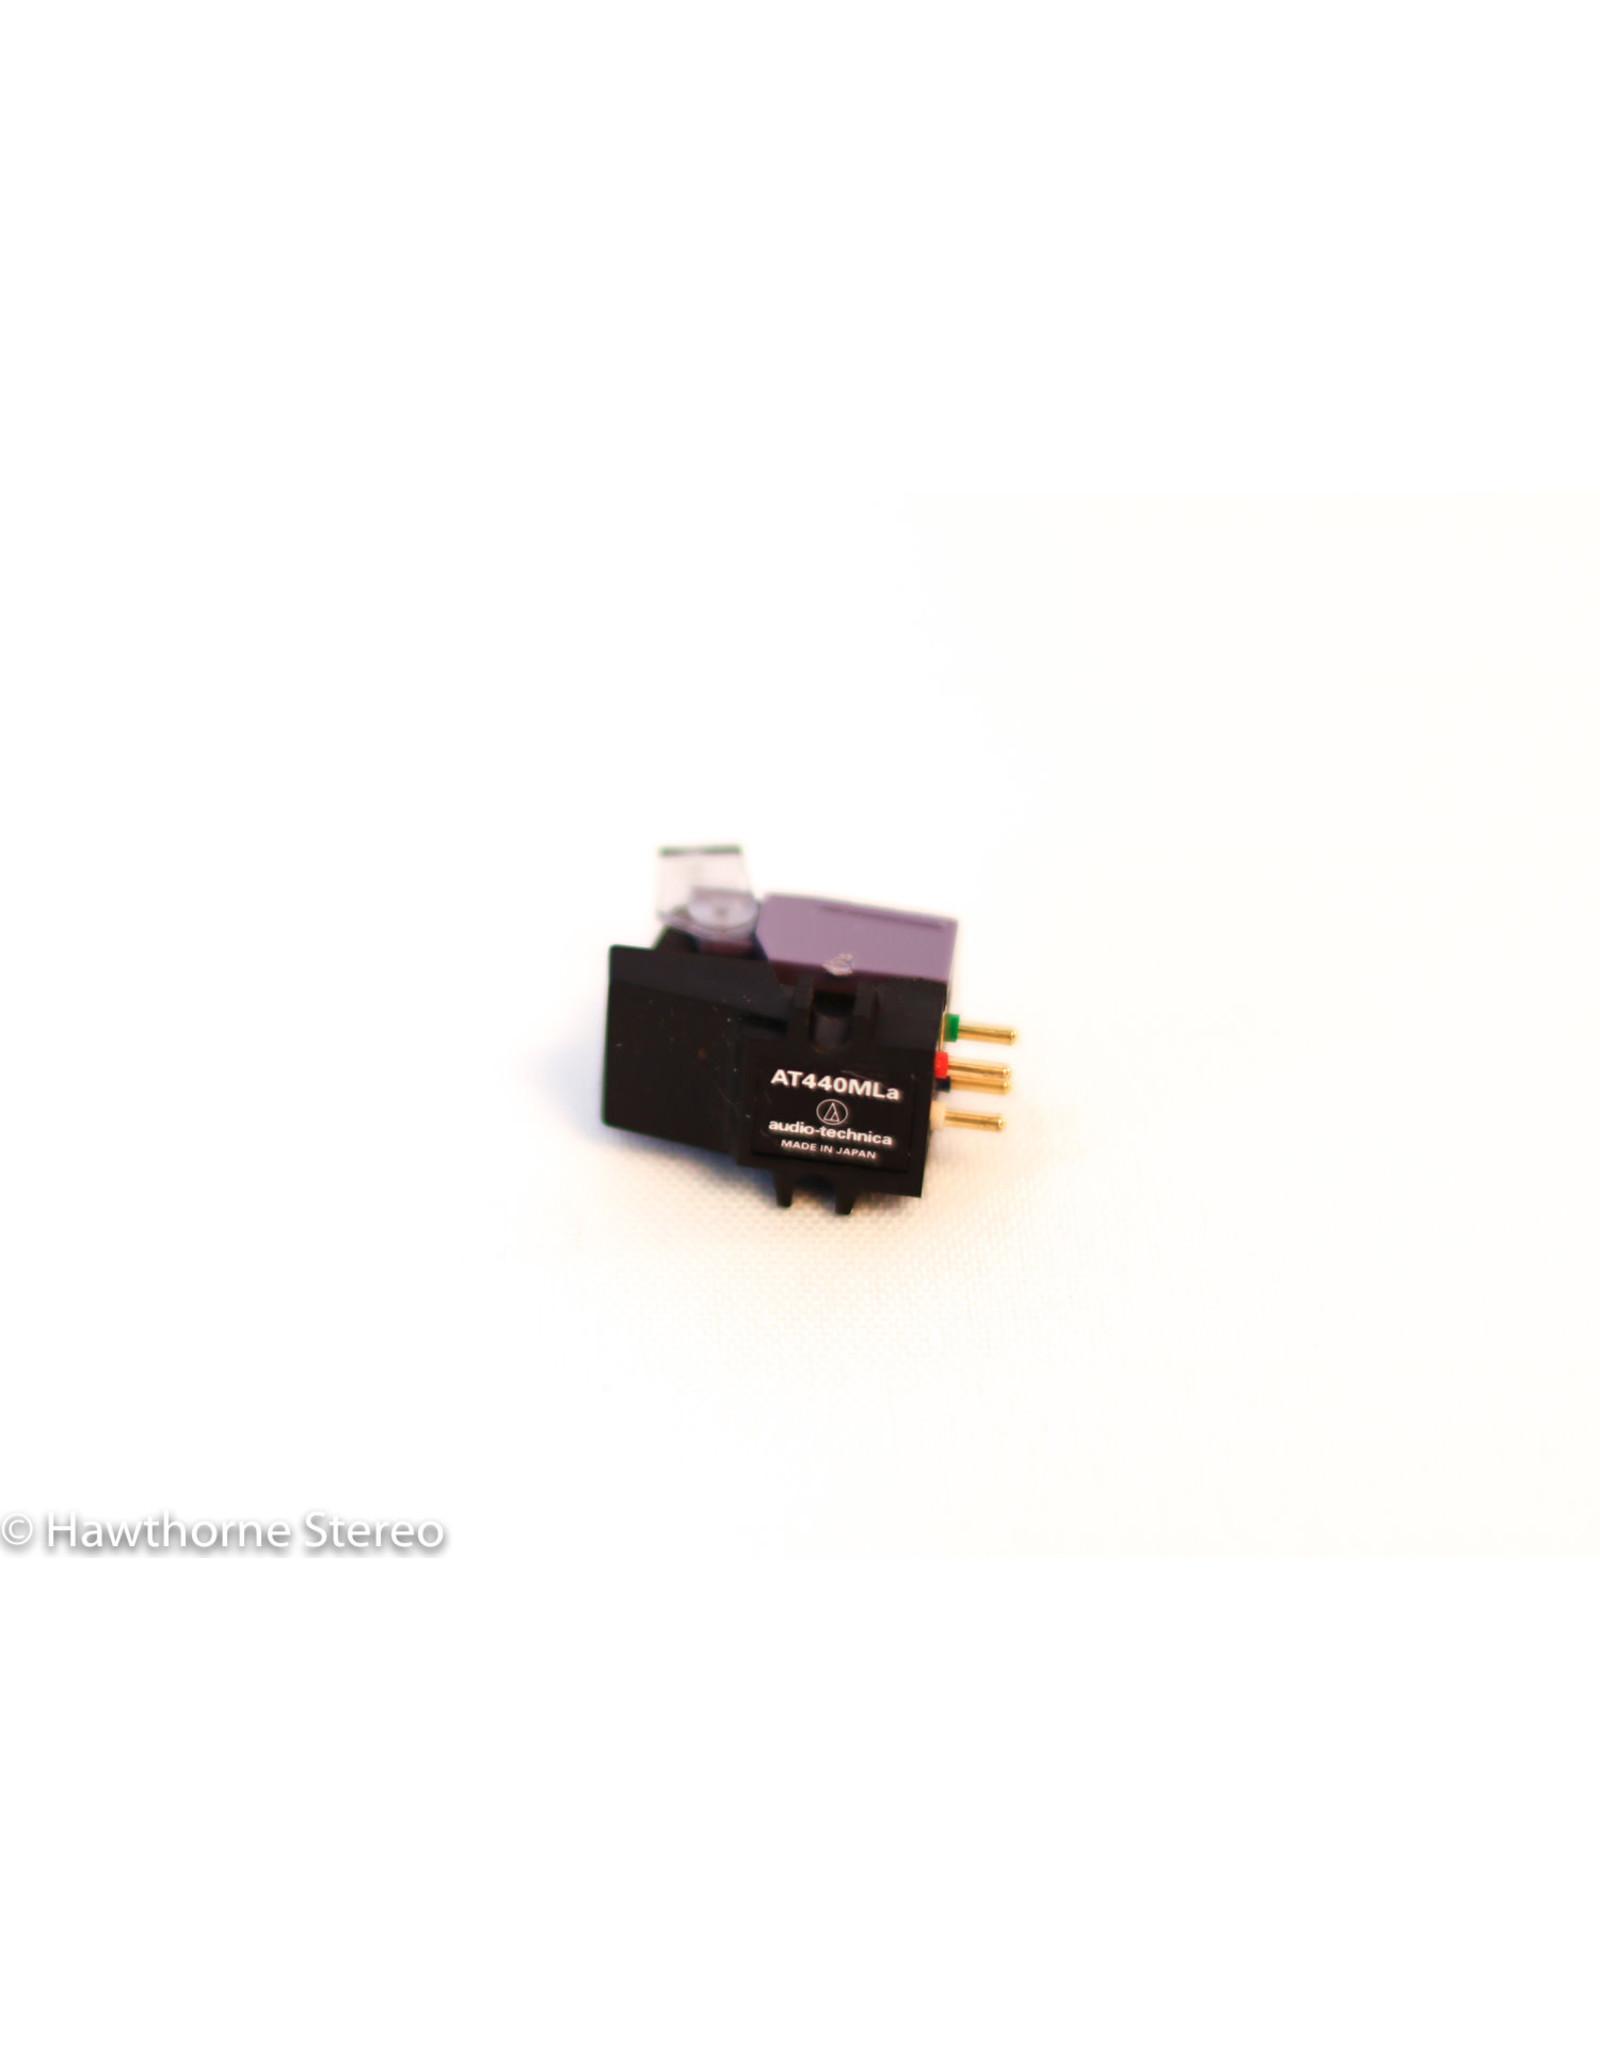 Audio-Technica Audio-Technica 440MLA Phono Cartridge USED